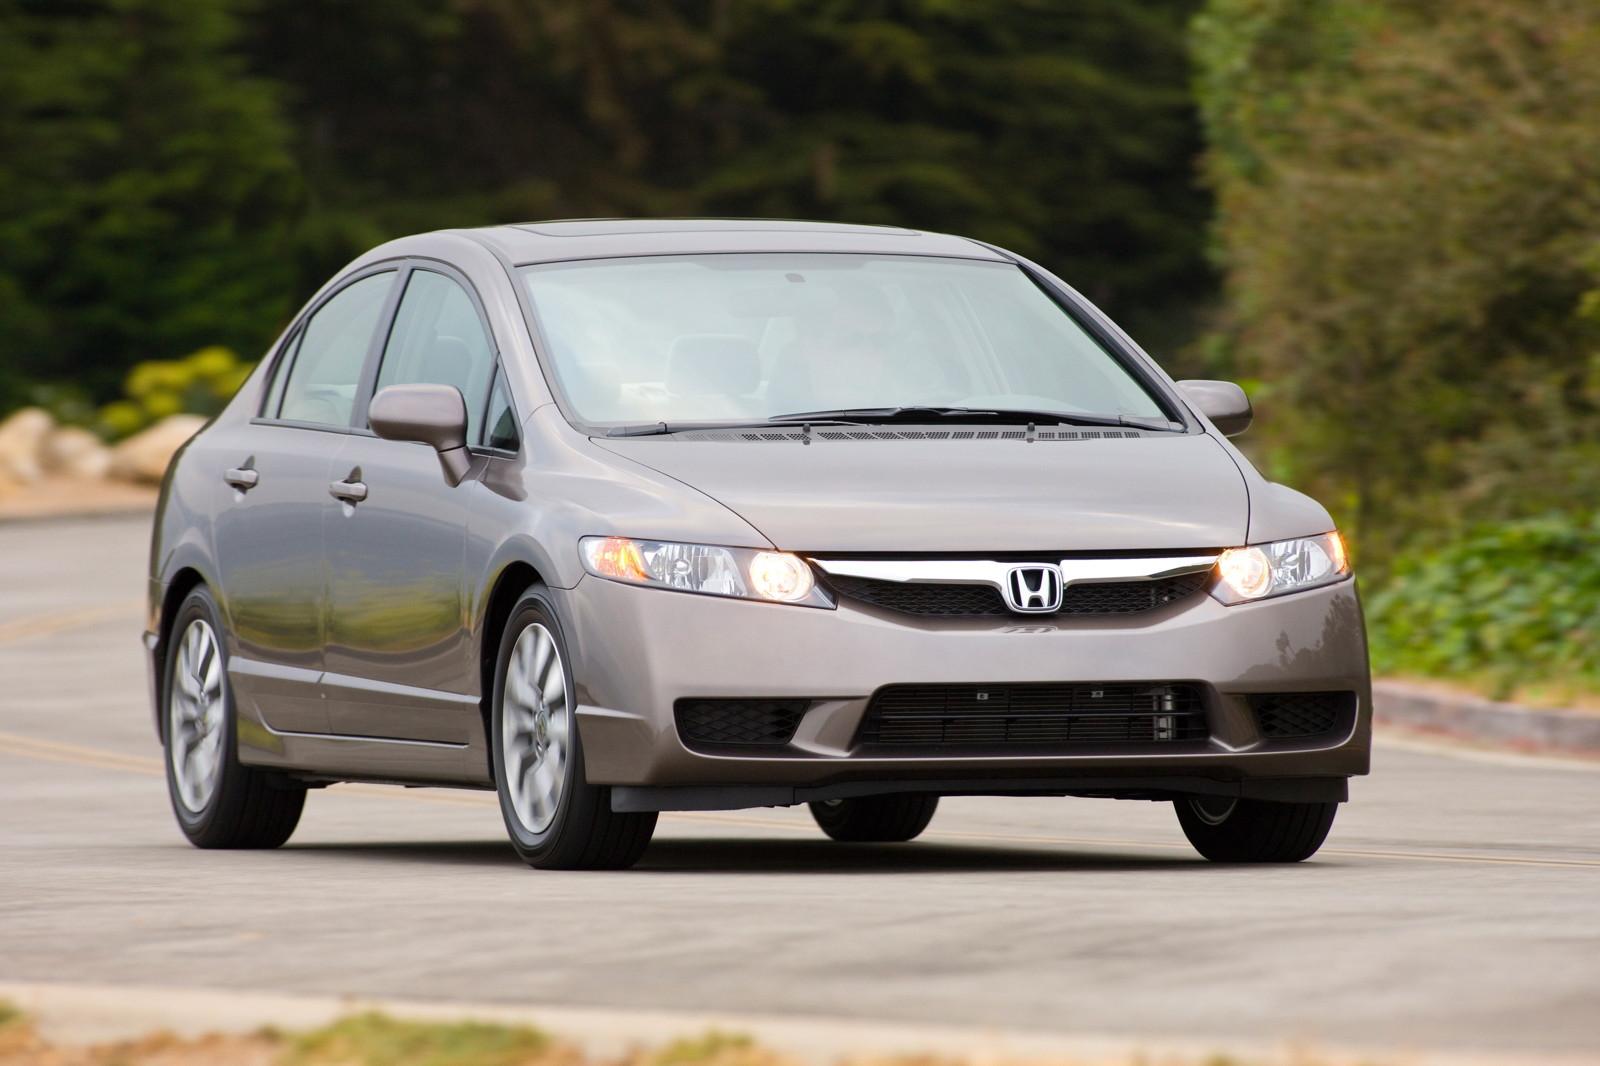 Honda honda civic 2003 hybrid : 2012 Honda Civic Ultimate Guide: Reviews, Gas Mileage, Videos